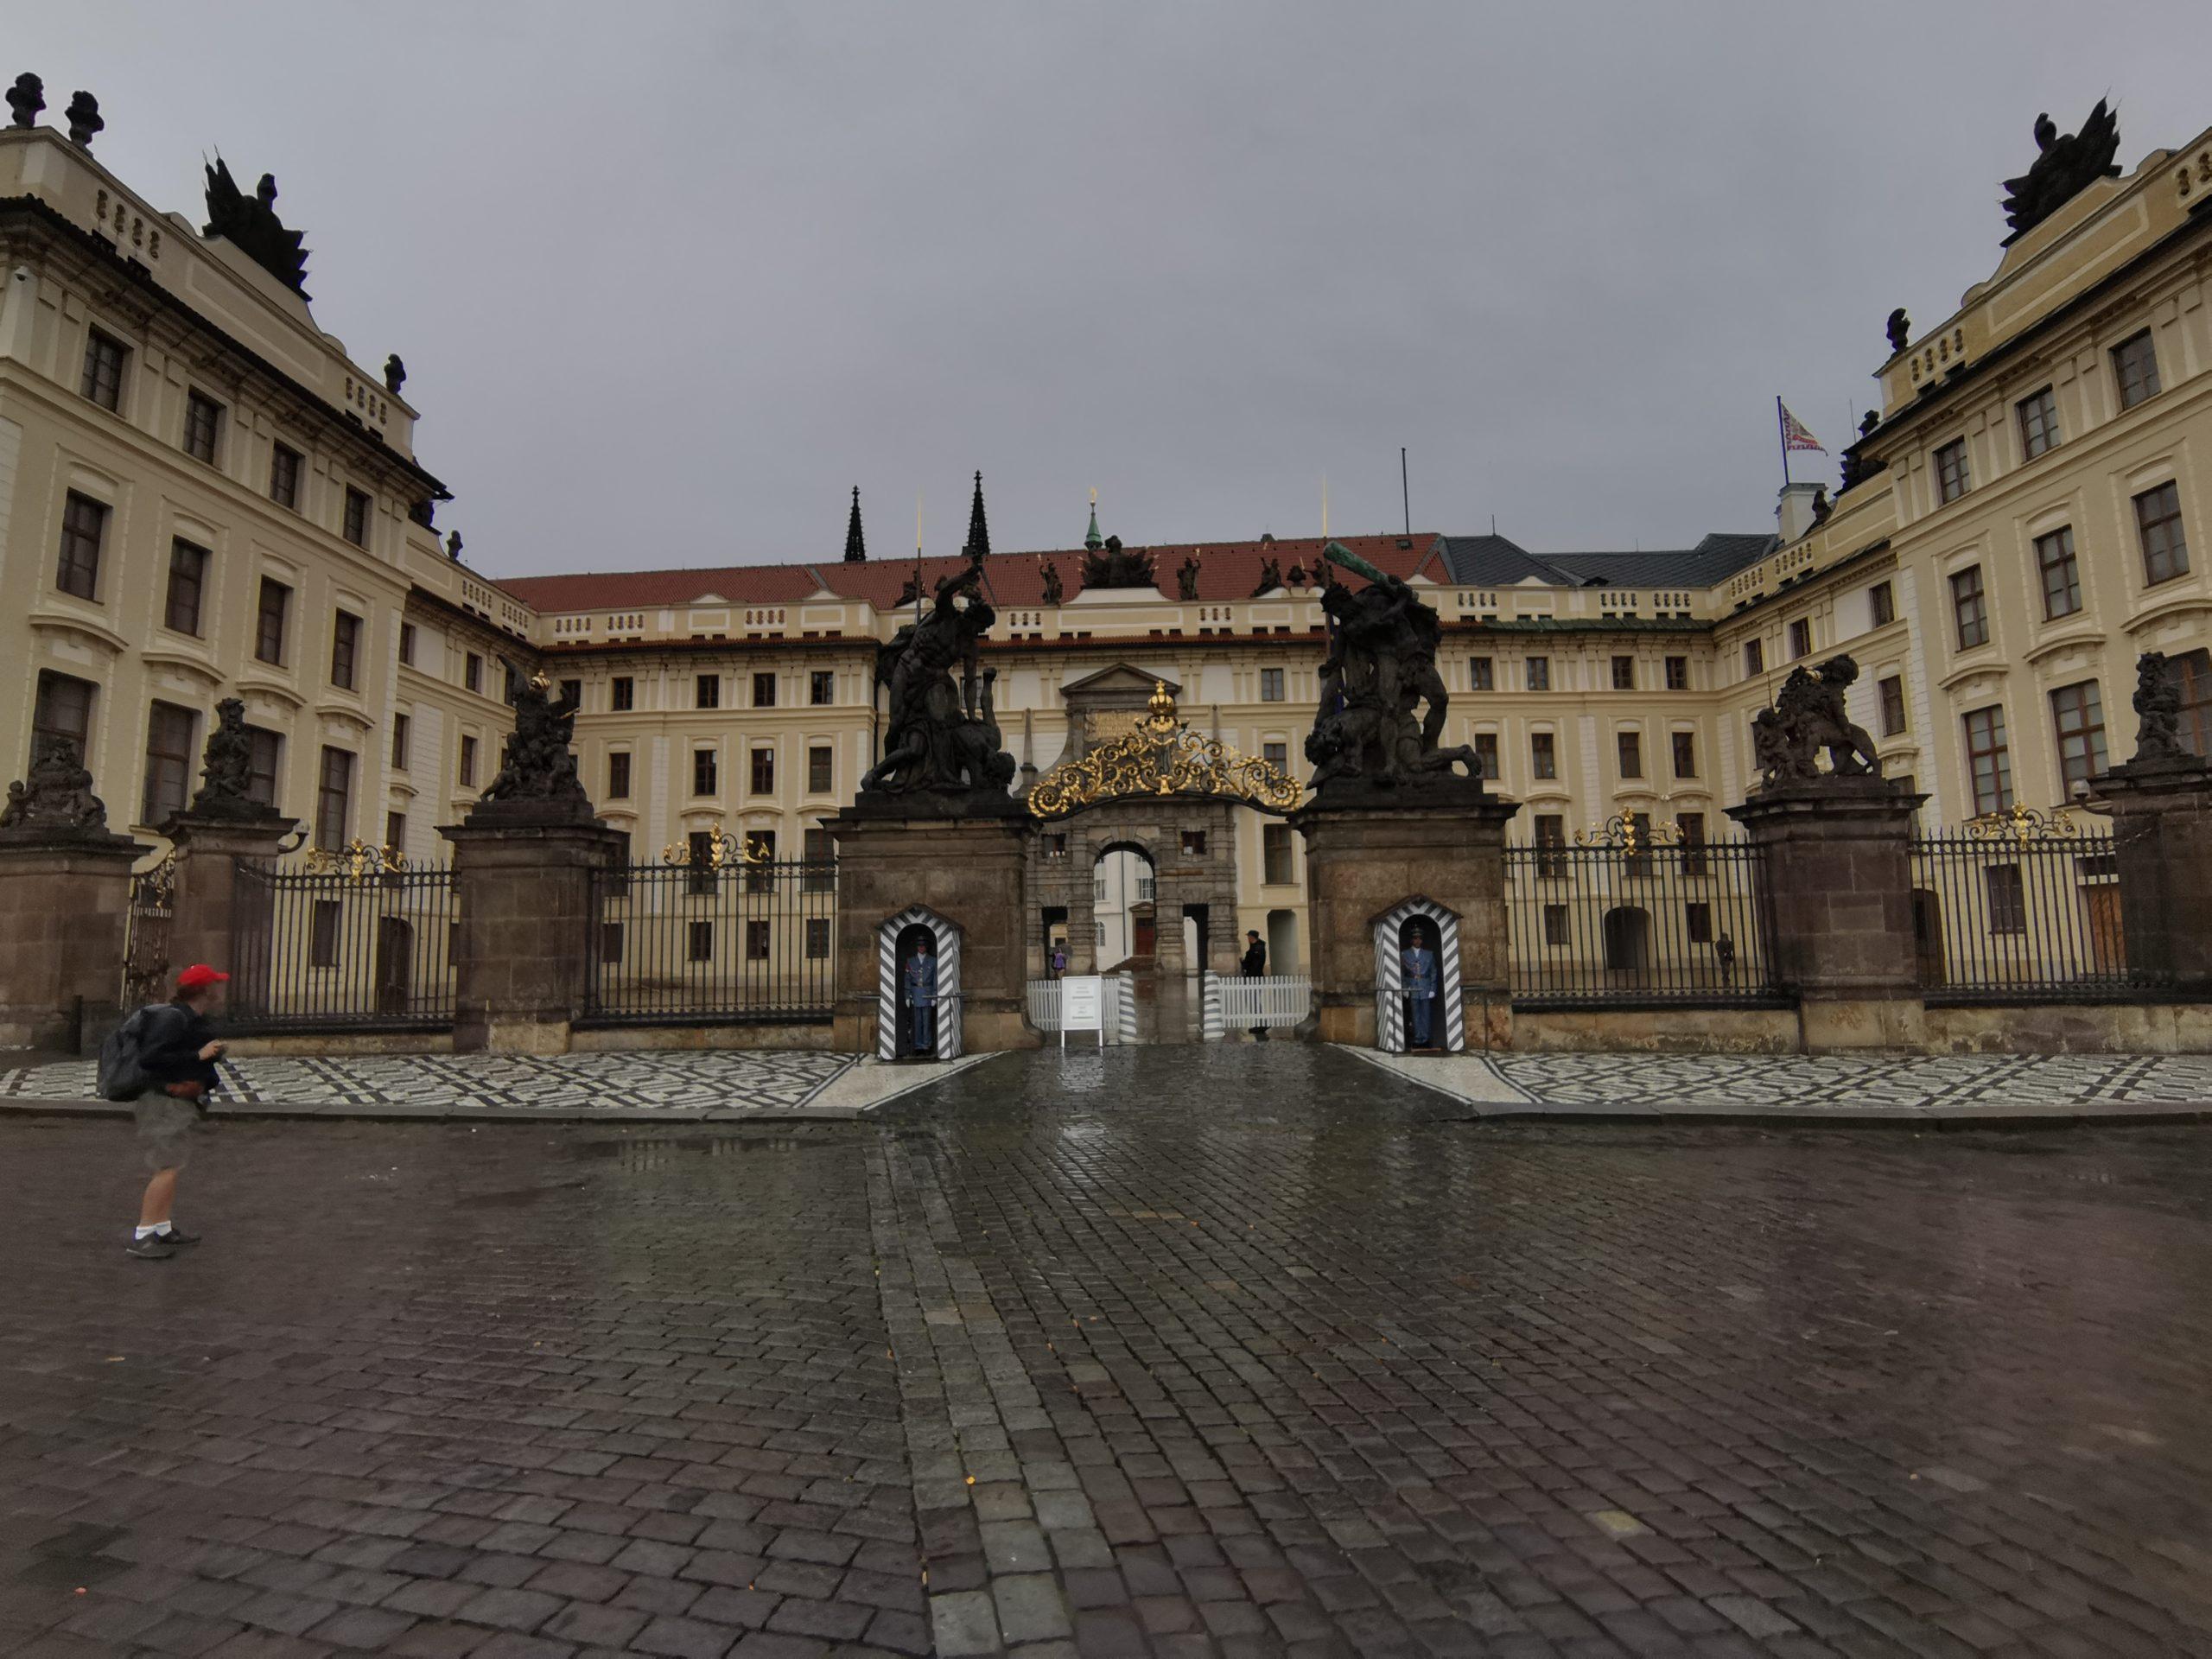 castillo-Praga-palacio-real